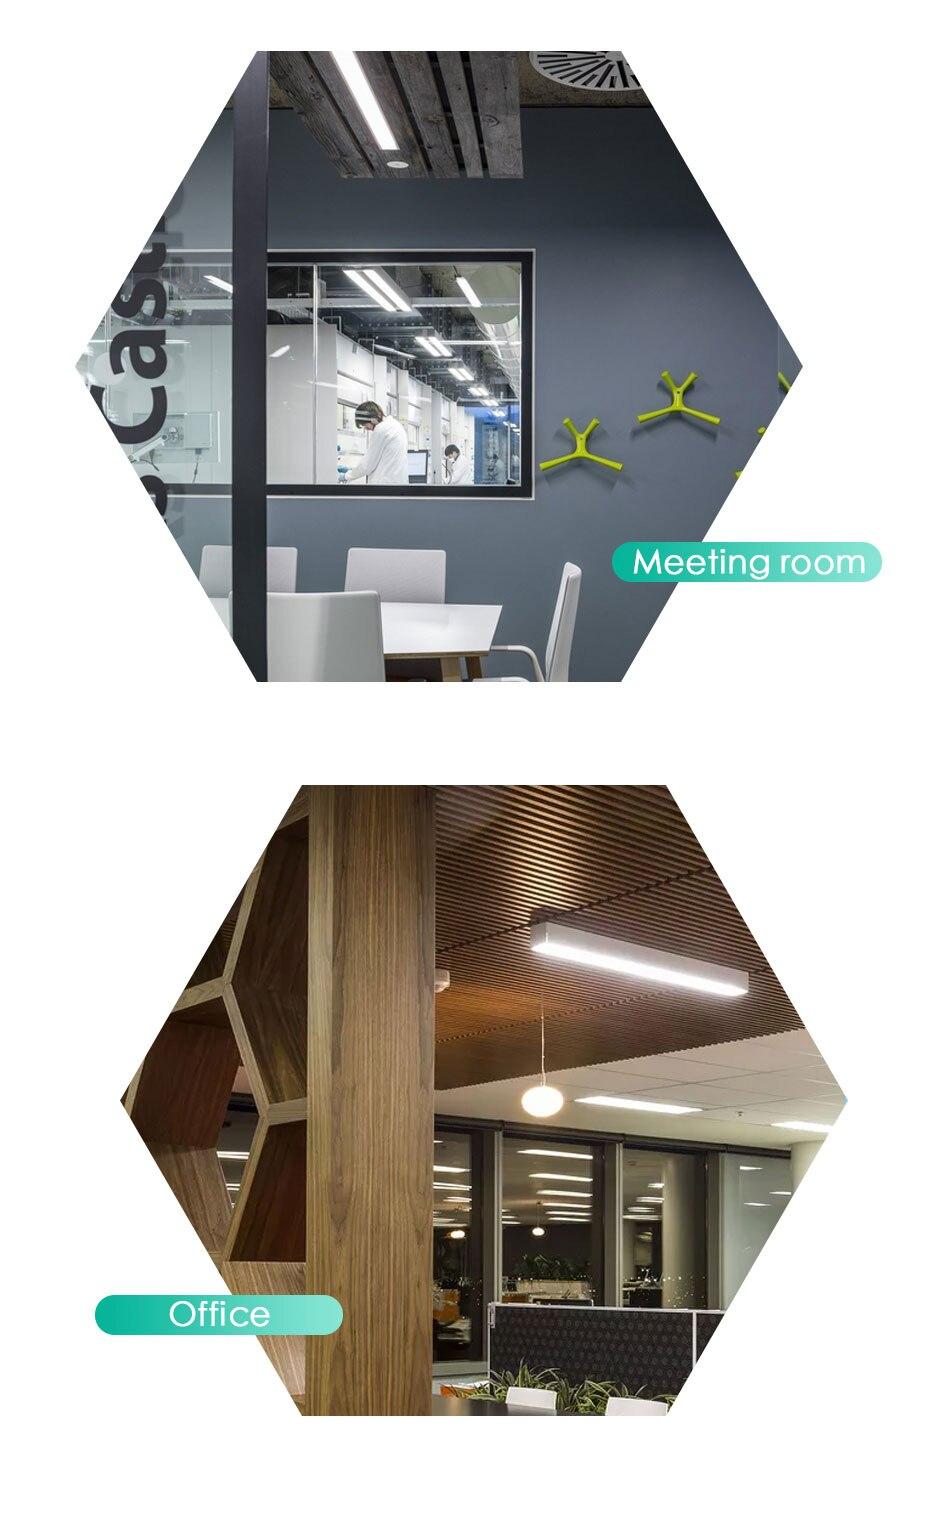 Hac17bae3e6684c9092c9f265b52187e9B Modern LED Ceiling Light Lamp Lighting Fixture Rectangle Office Remote Bedroom Surface Mount Living Room Panel Control 110V 220V